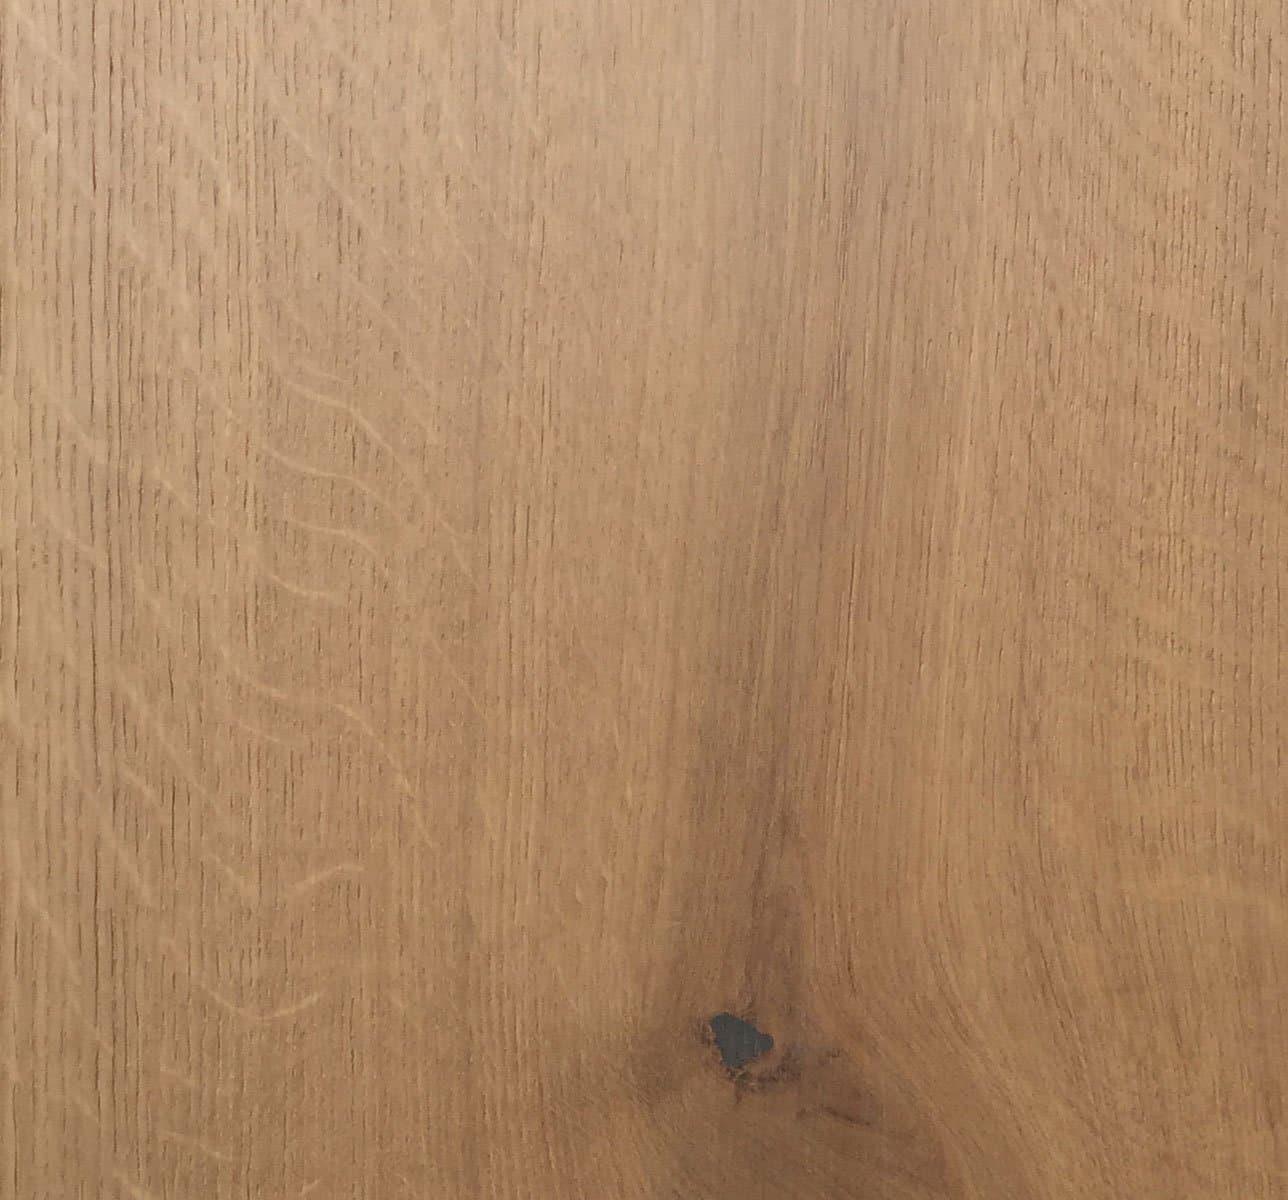 Sienna White Oak Hardwood Planet Flooring